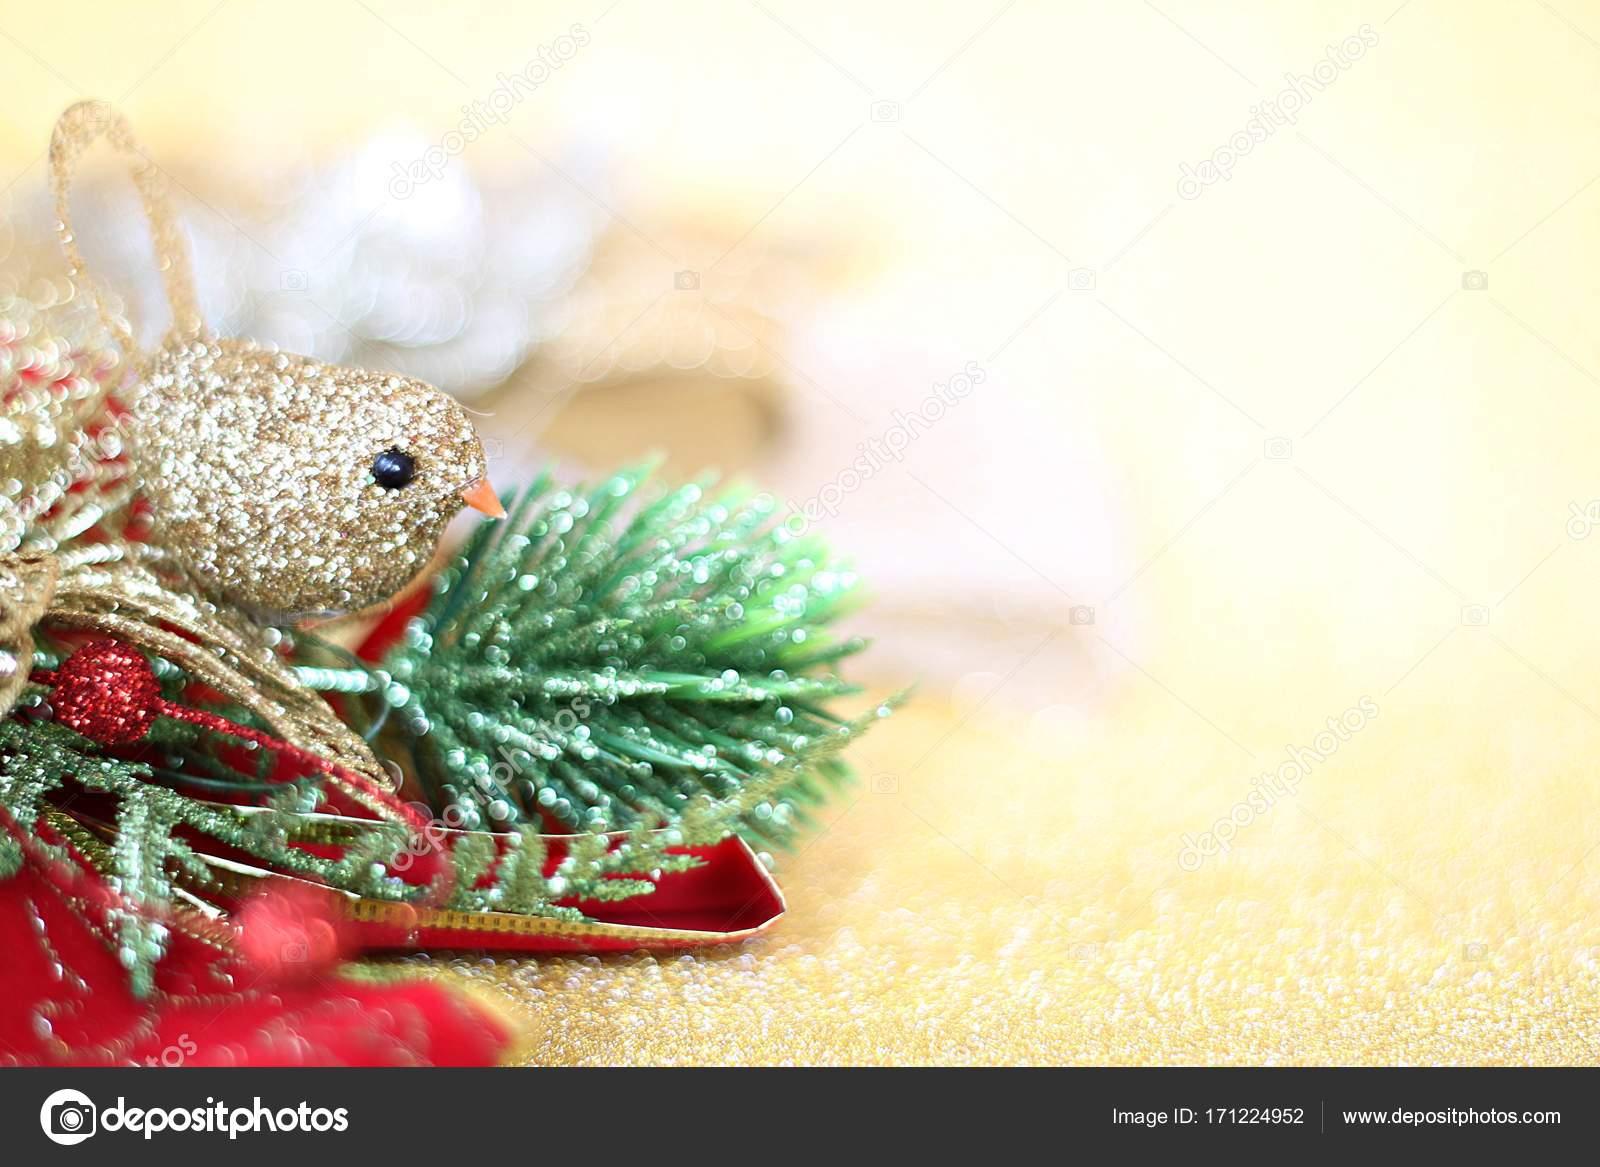 kerst ornamenten op goud glitter achtergrond verlichting stockfoto